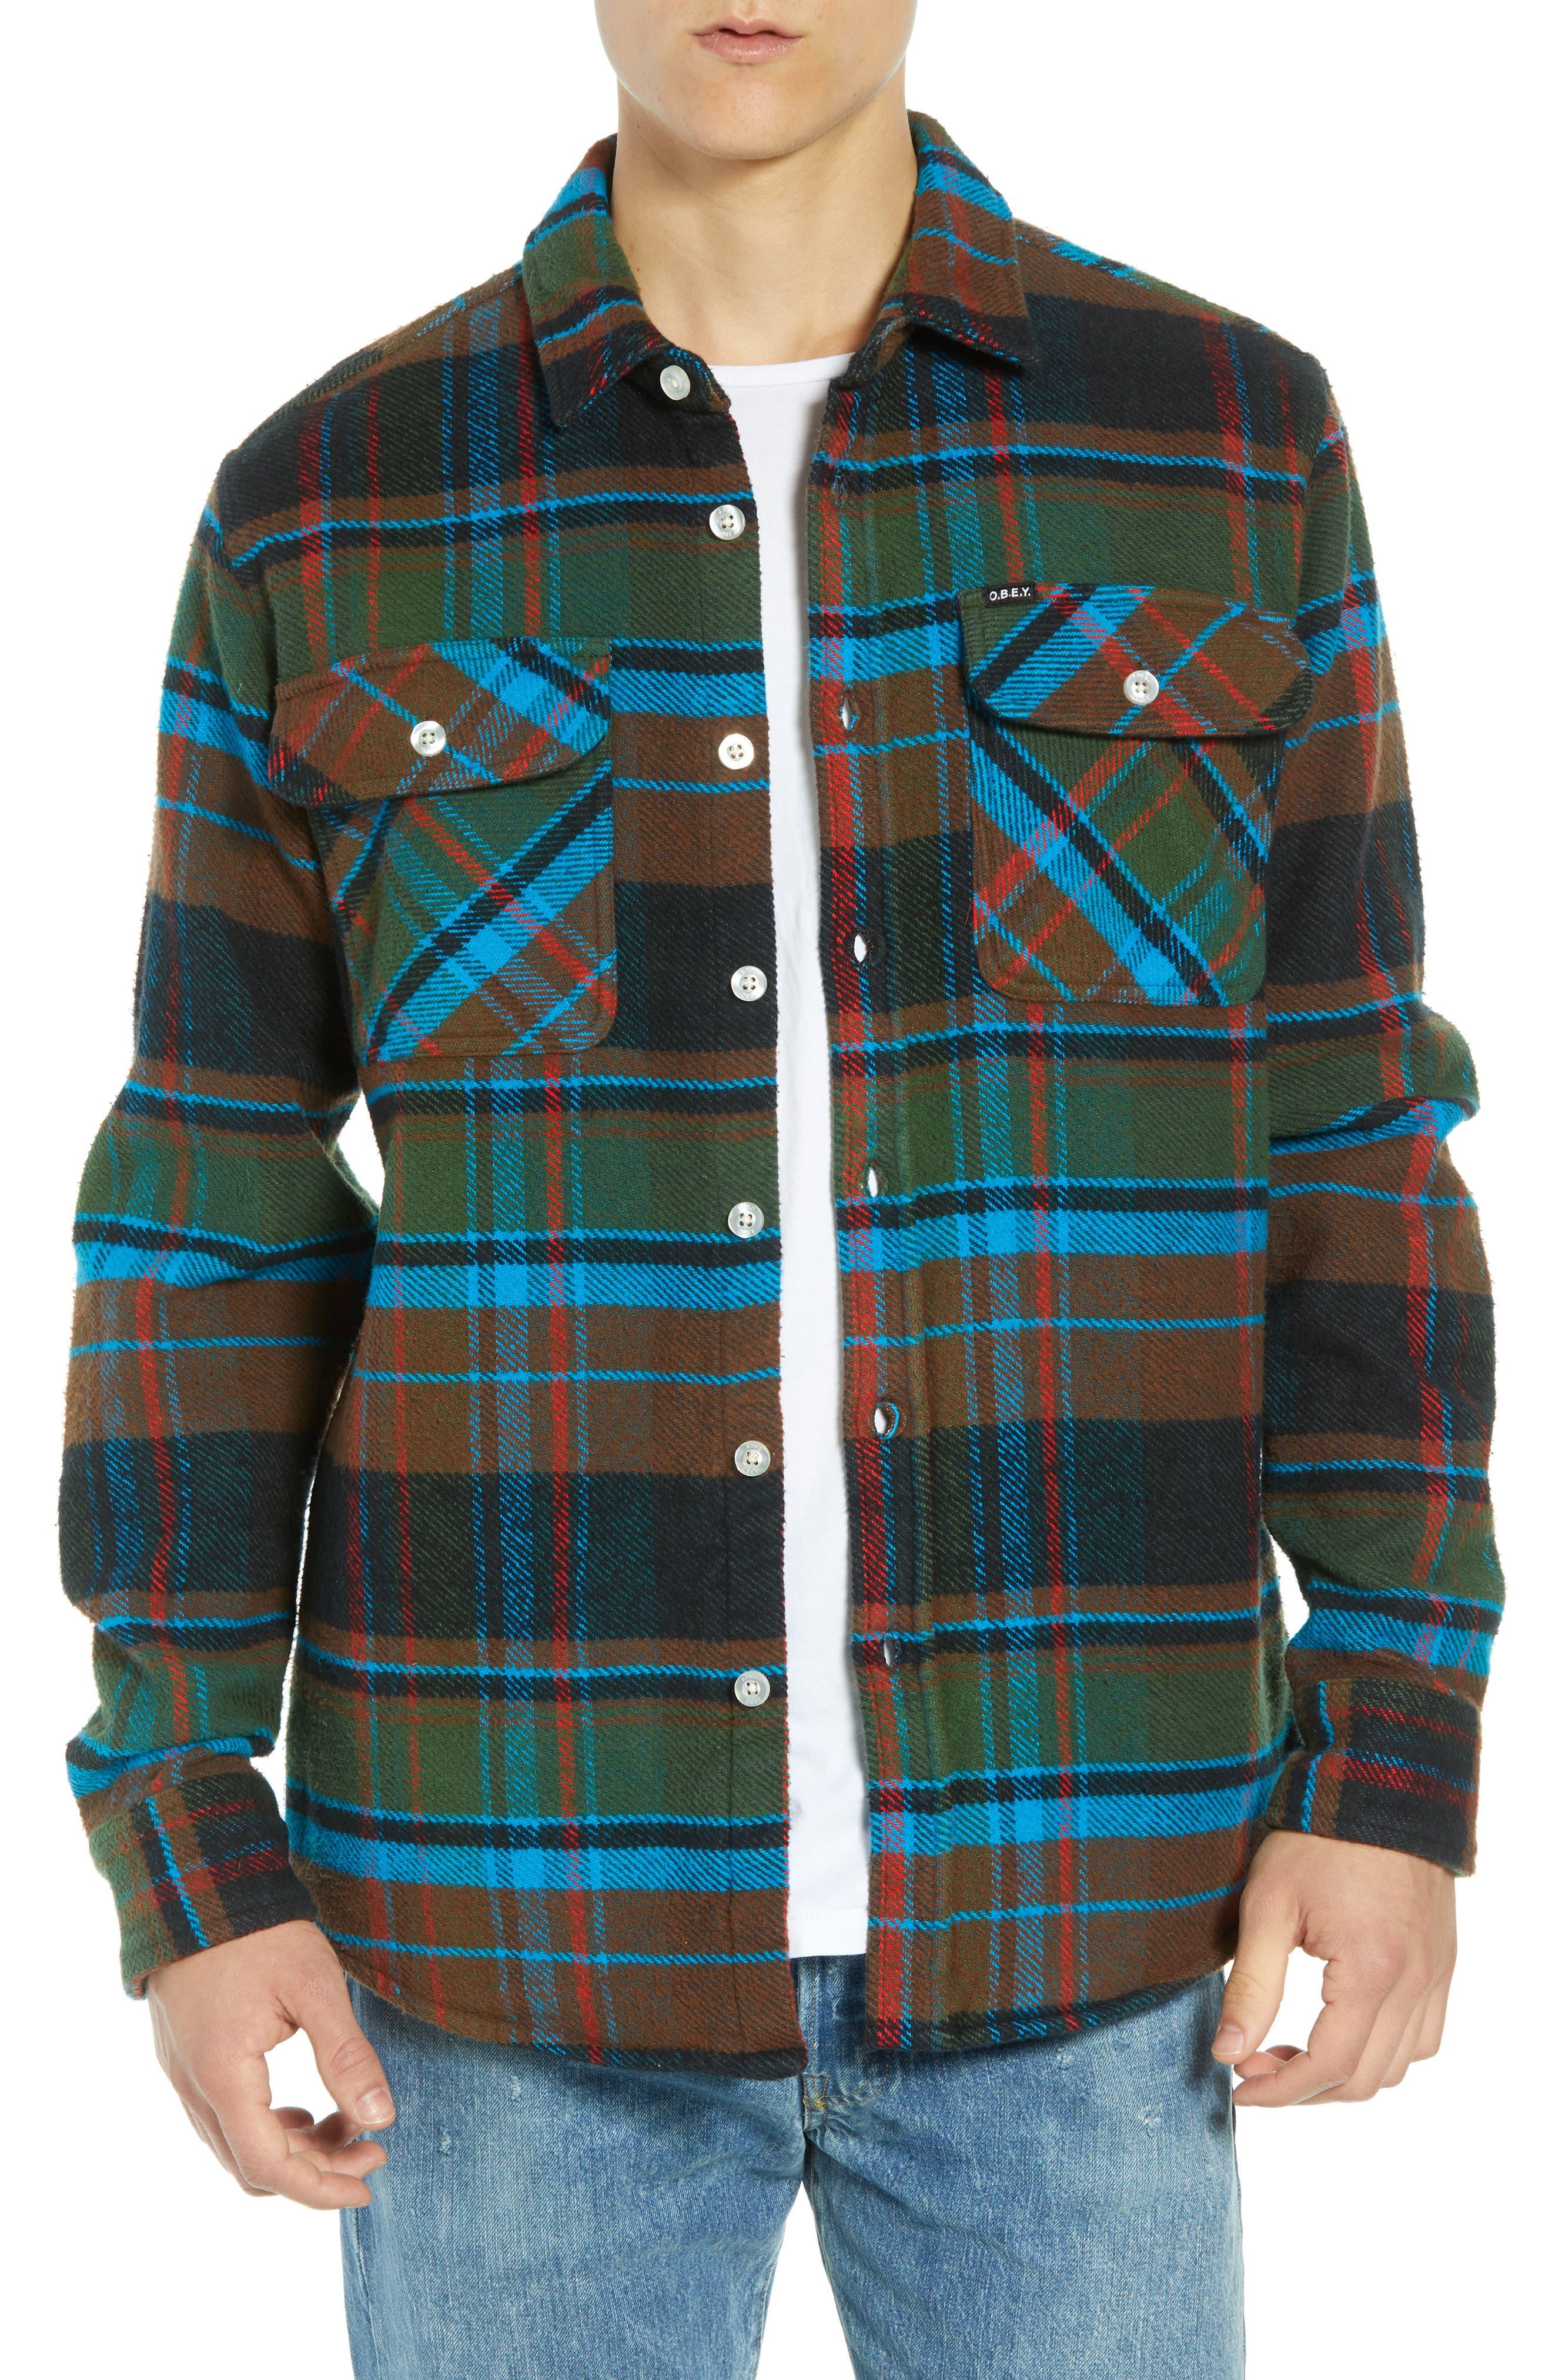 Homebound Heavy Plaid Flannel Shirt Jacket,                             Main thumbnail 1, color,                             BLACK FORREST MULTI